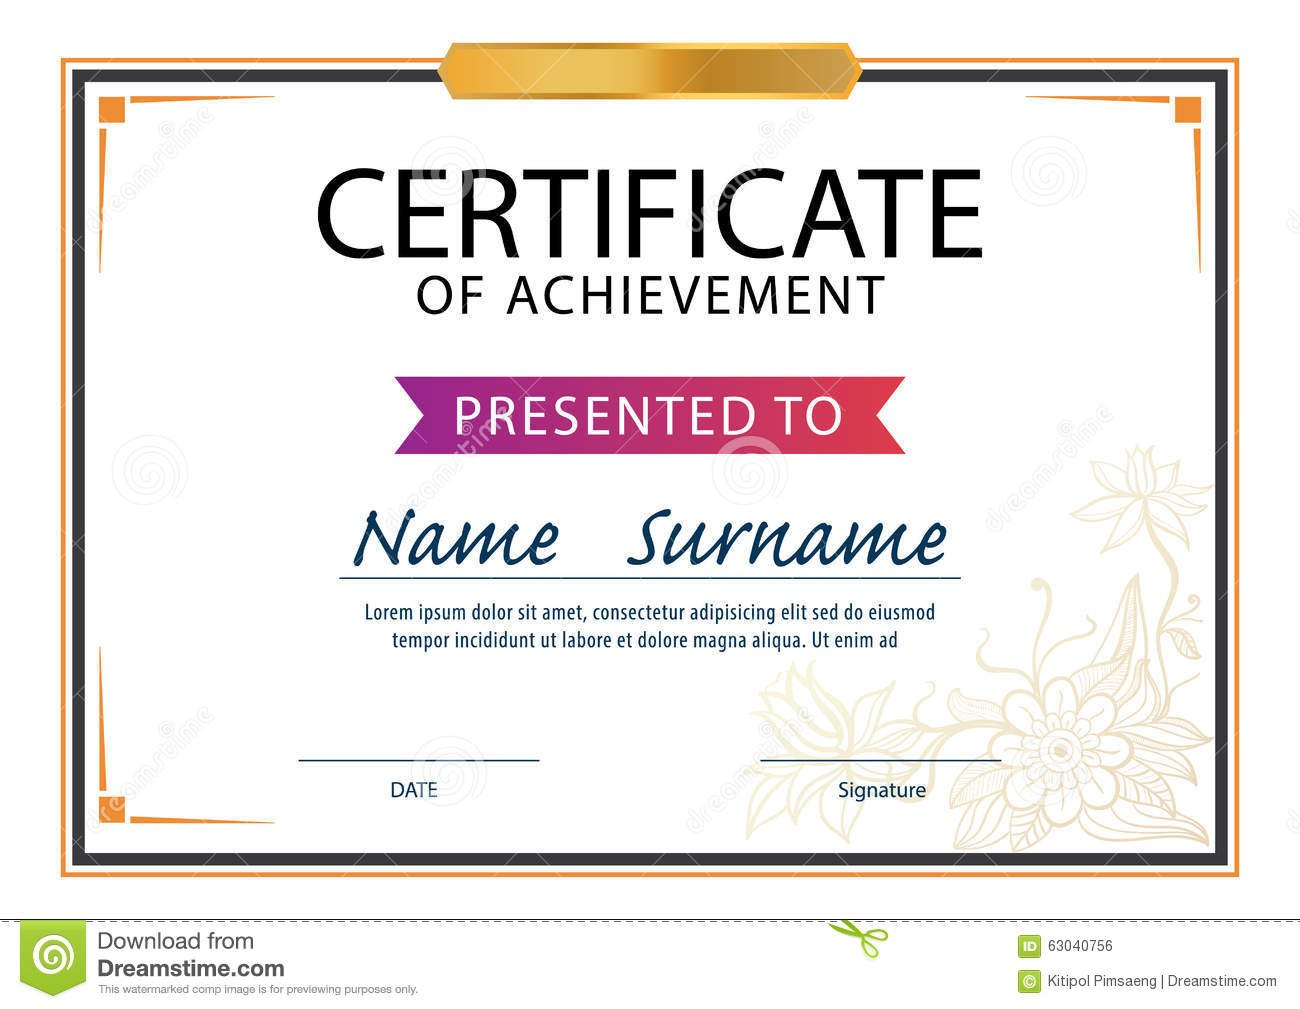 Certificate Templatediploma Layouta Size Stock Vector In Certificate Template Size